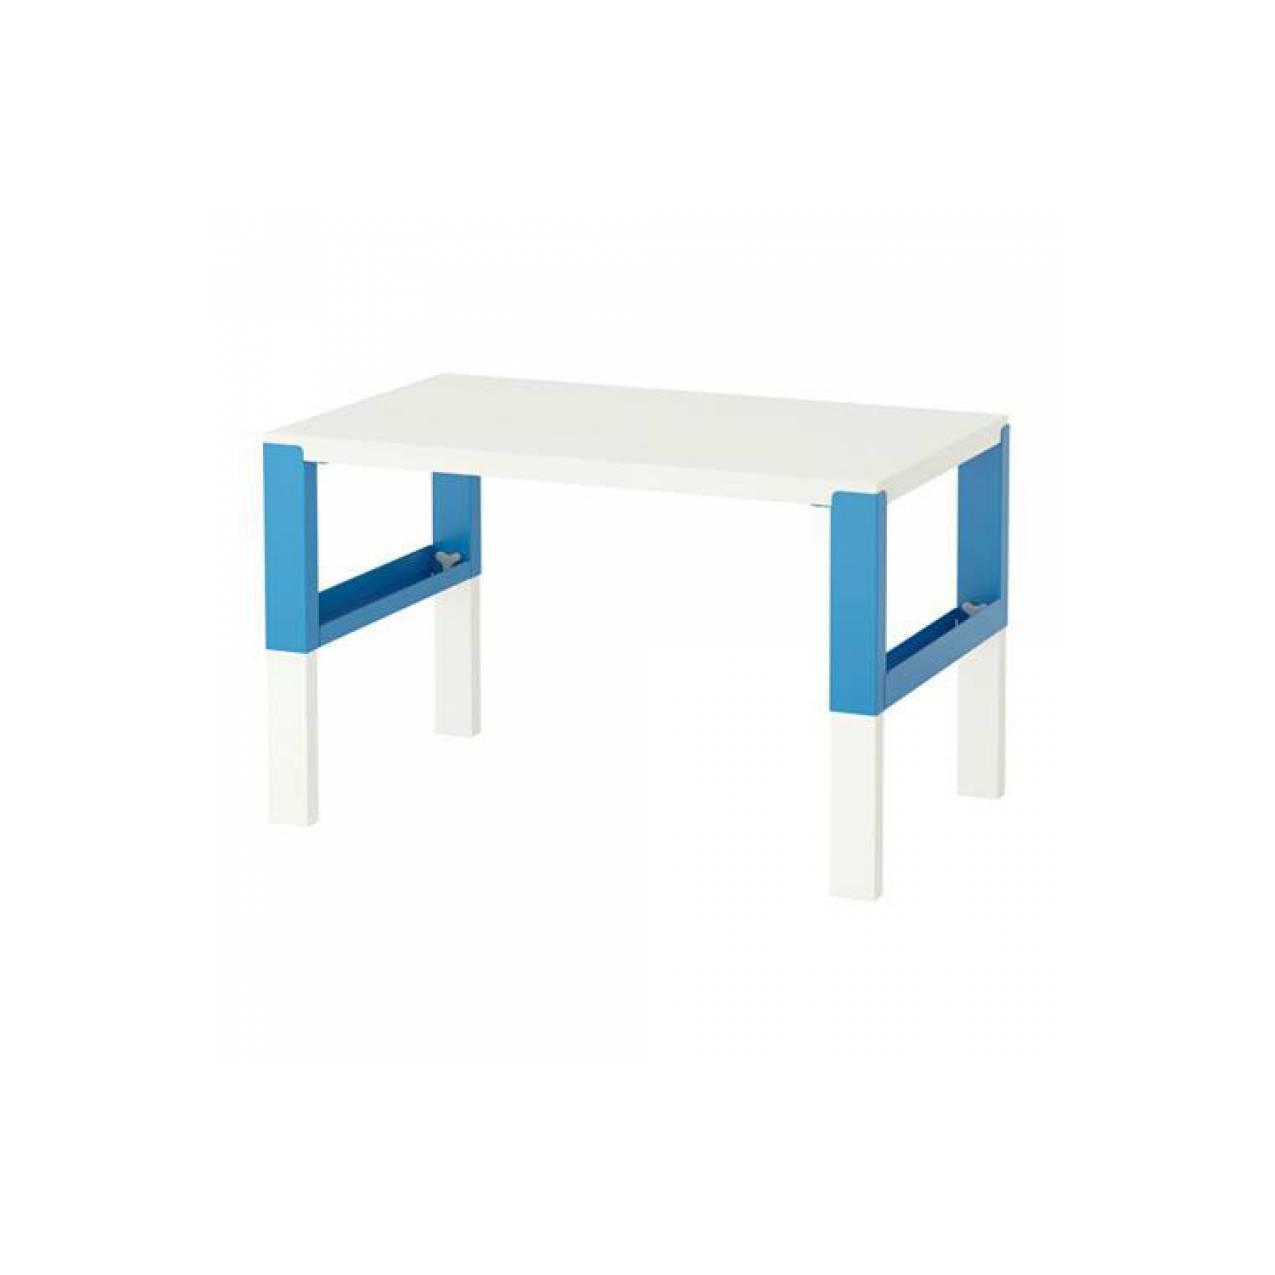 IKEA PAHL Meja Belajar Anak 96x58 cm - Biru, putih